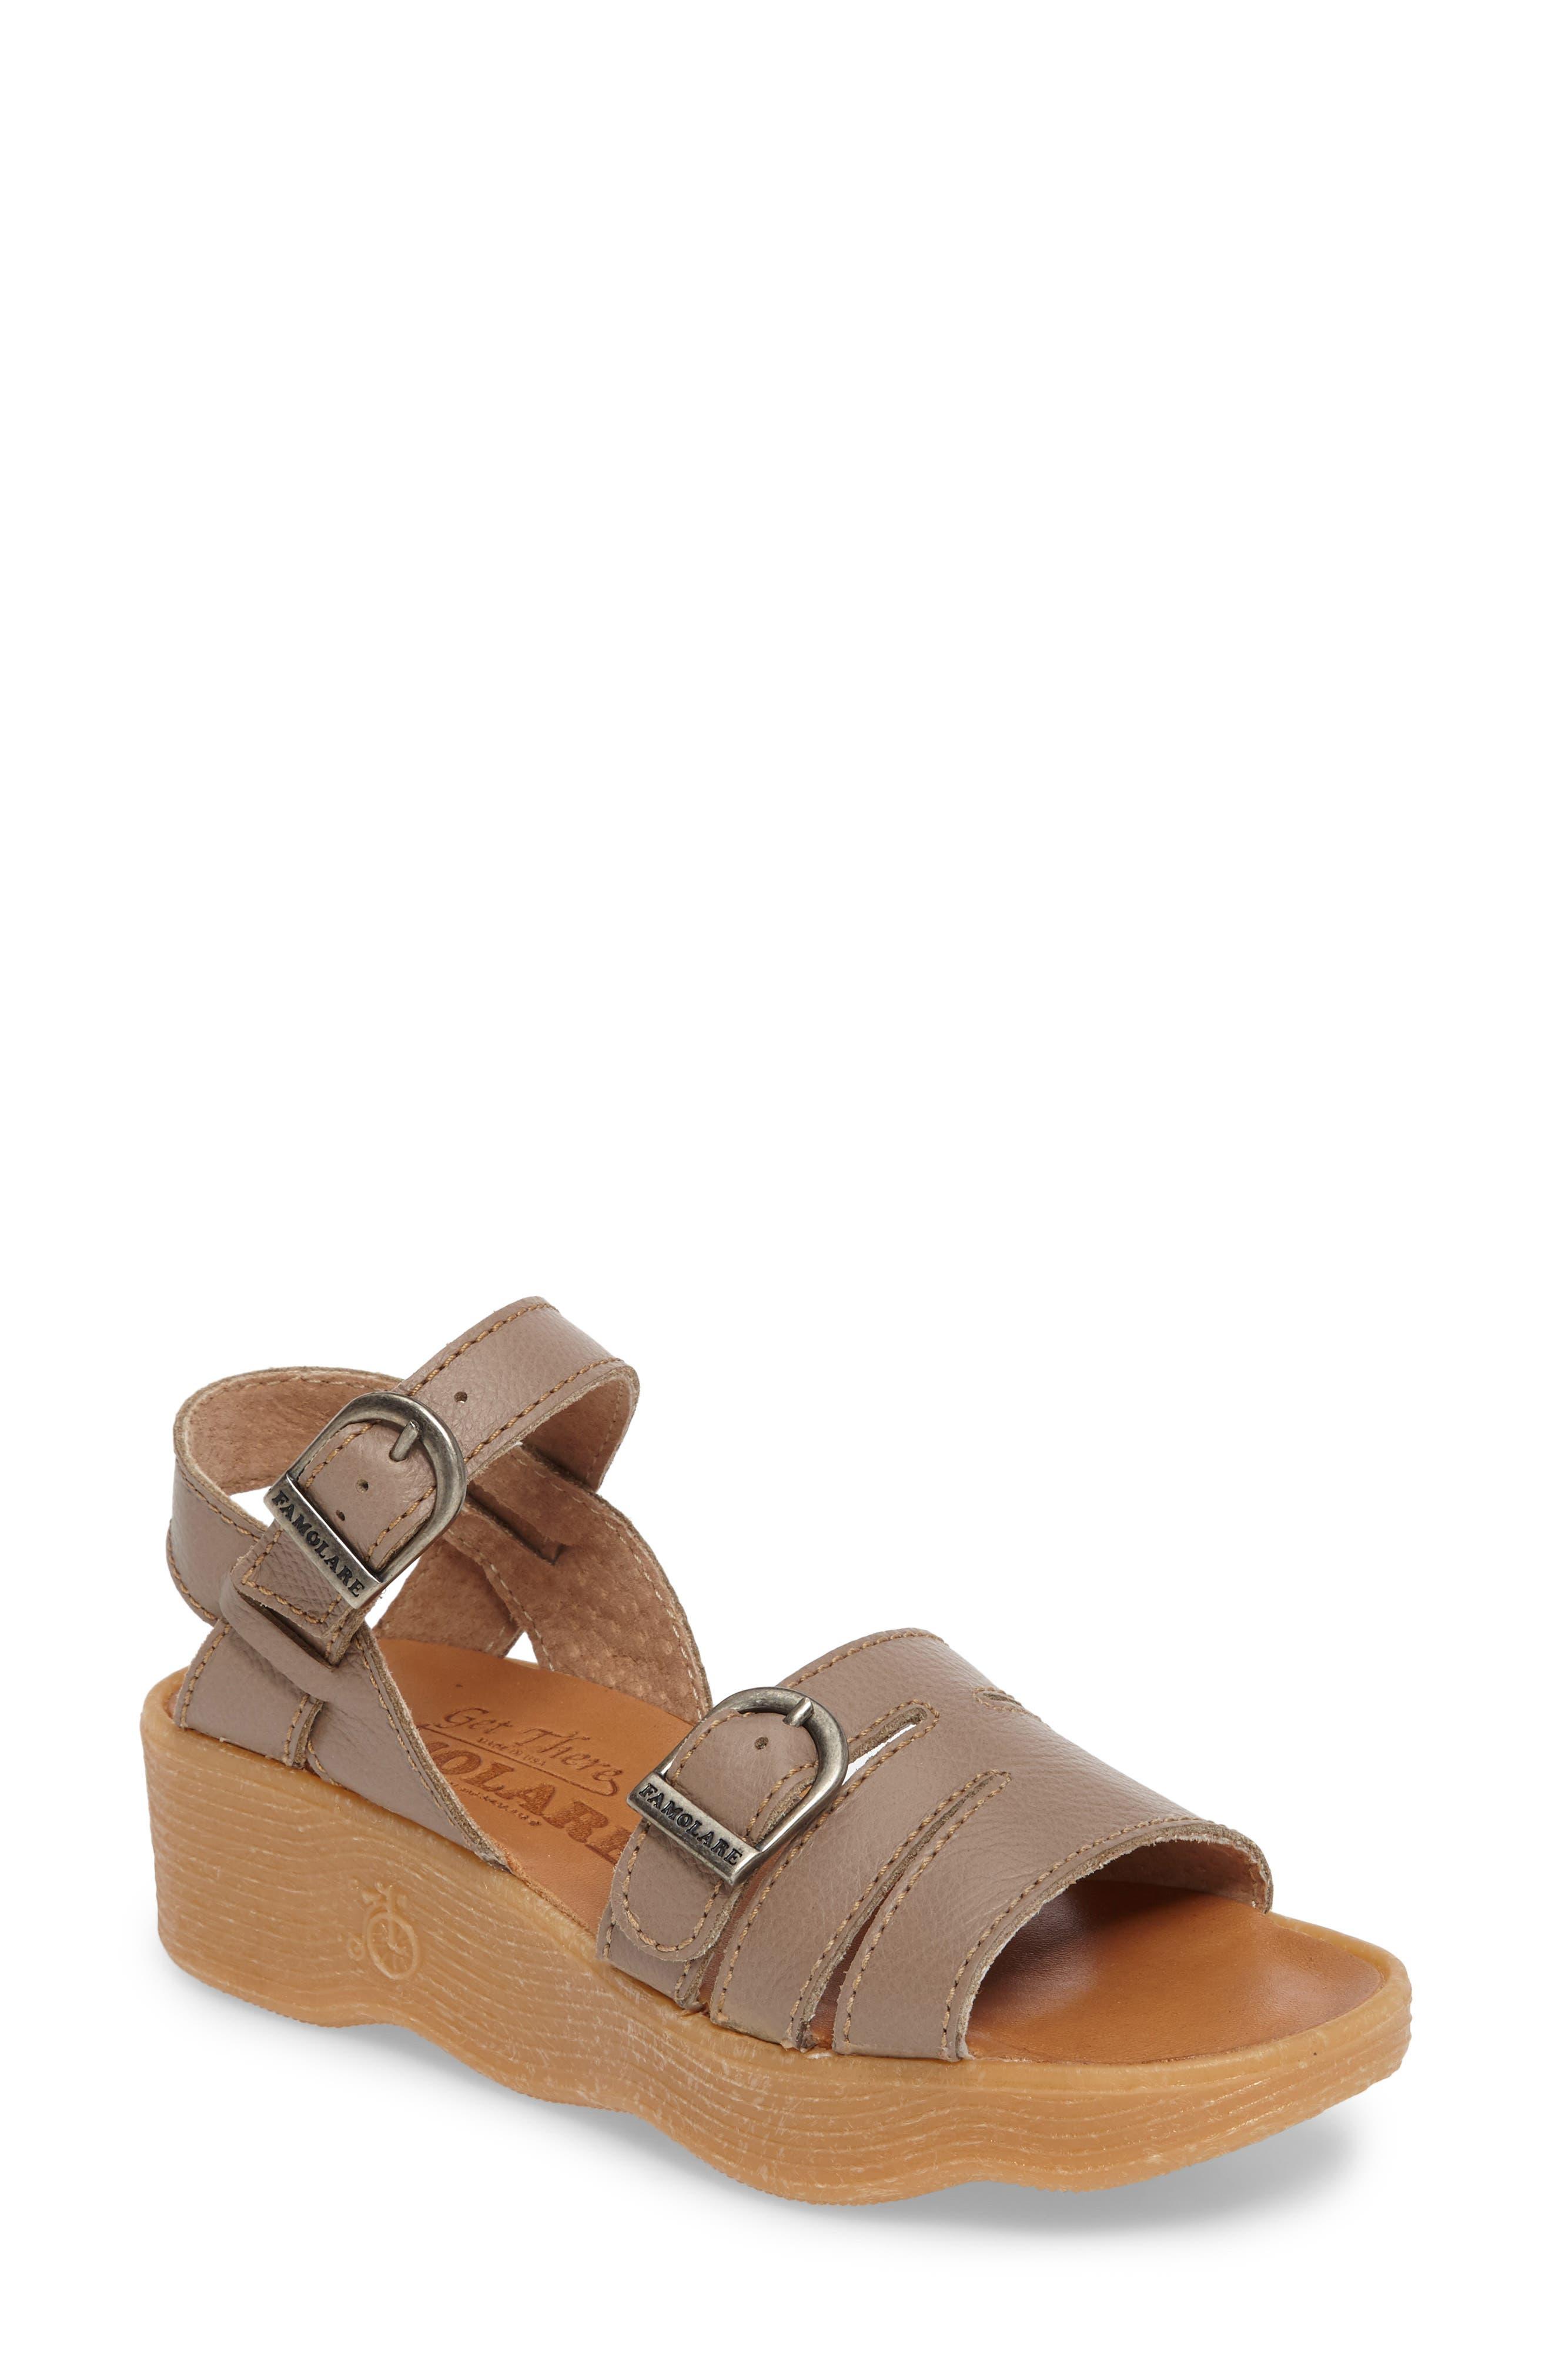 FAMOLARE Honeybuckle Wedge Sandal